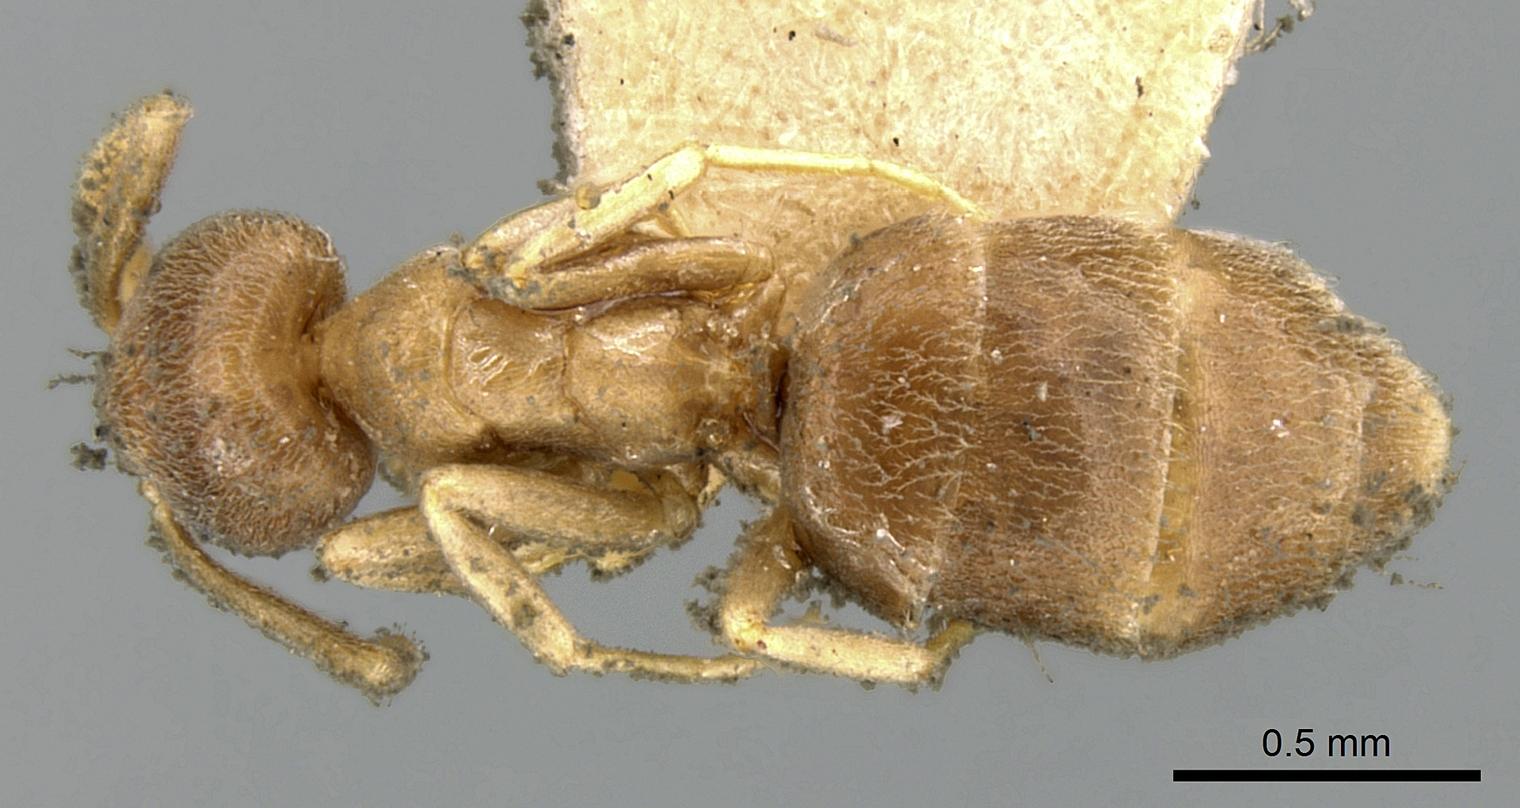 Image of Bothriomyrmex meridionalis